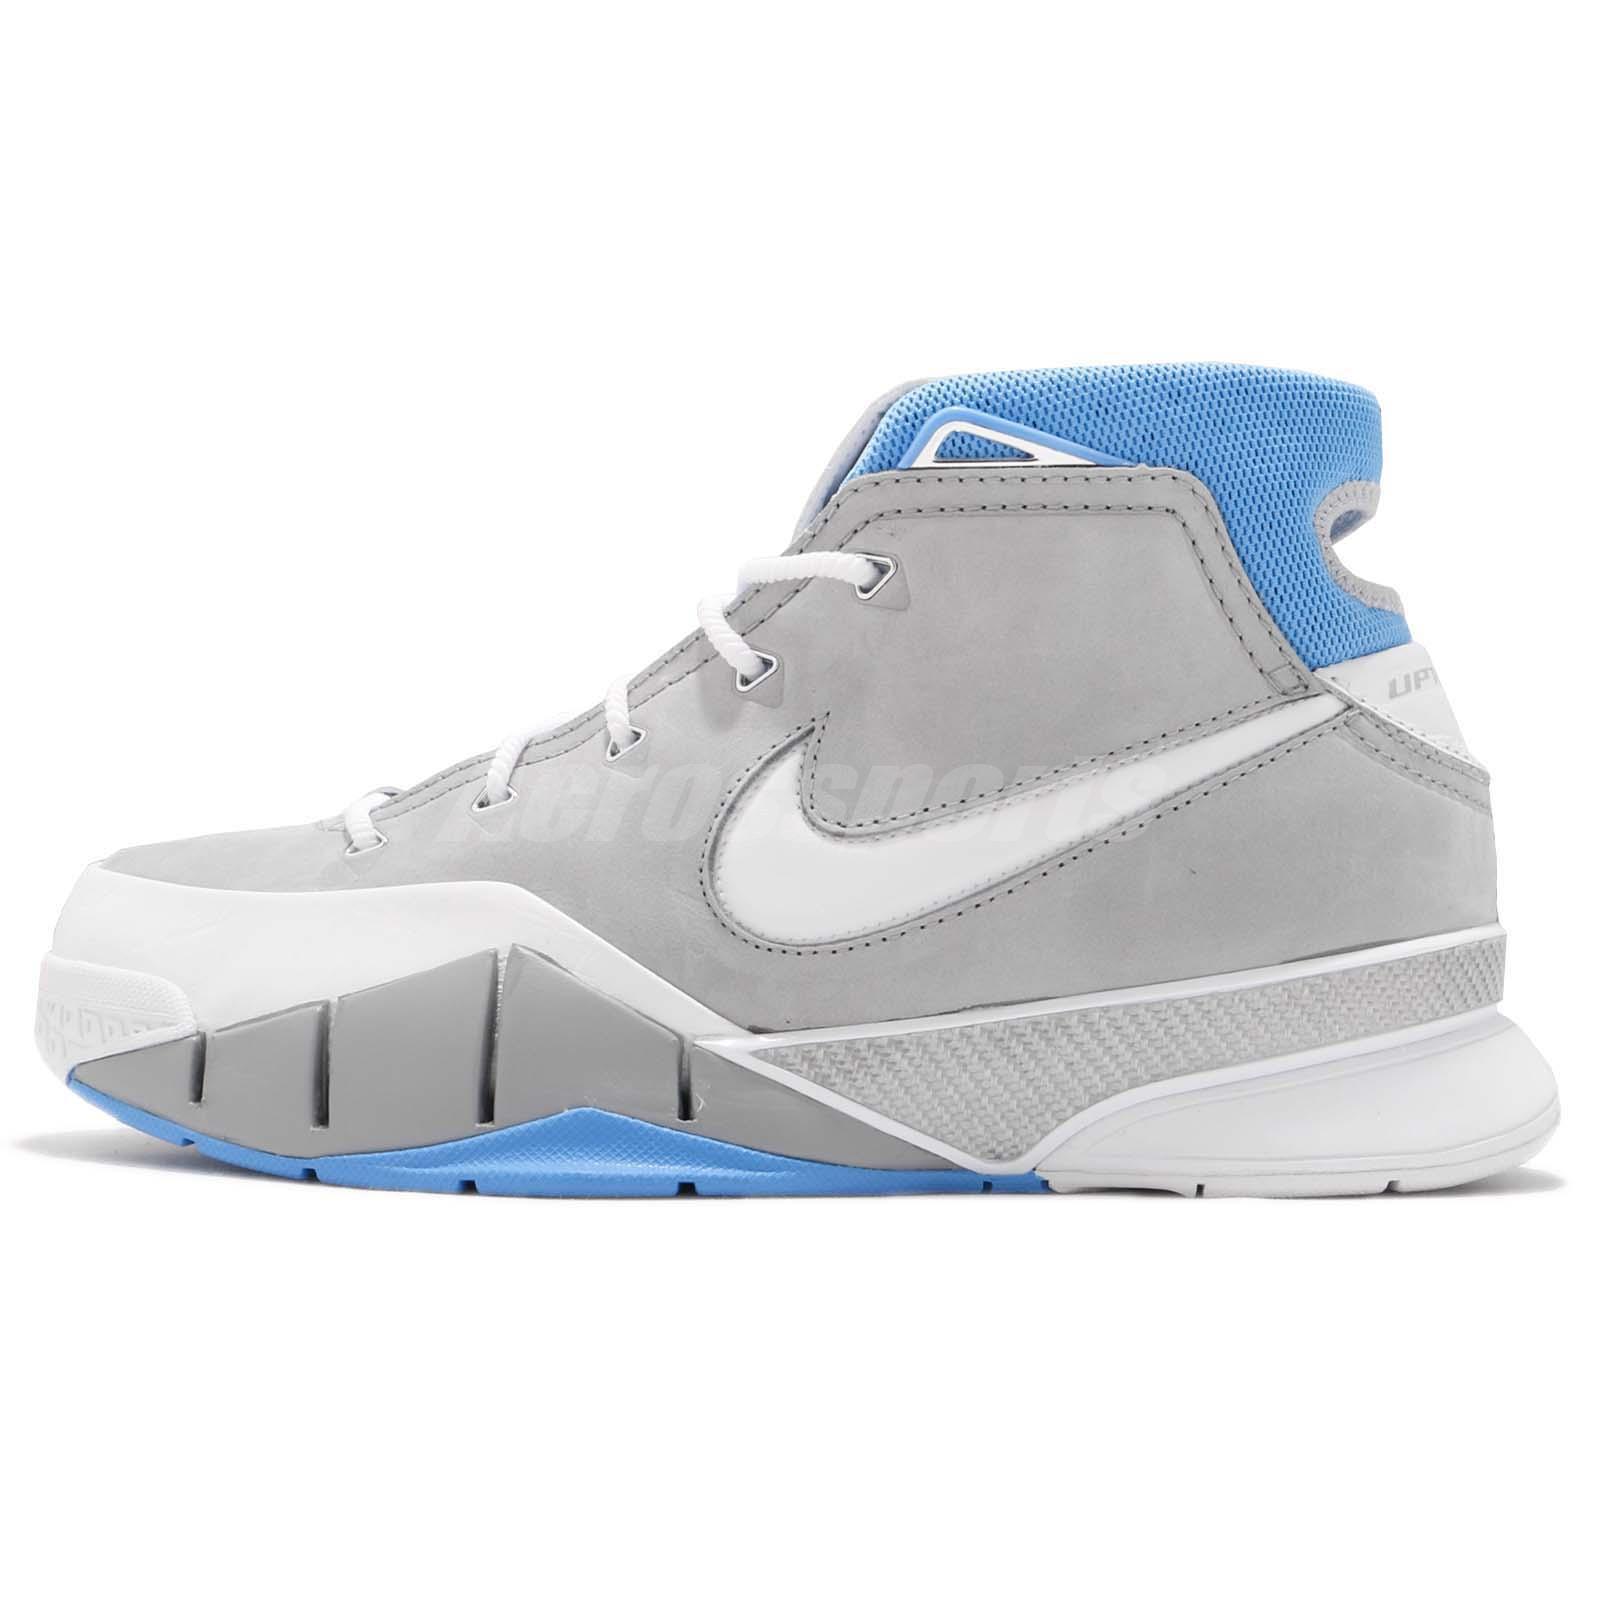 b286eb163e64 Nike Kobe 1 Protro MPLS Bryant Mamba Grey Blue Men Basketball Shoes  AQ2728-001